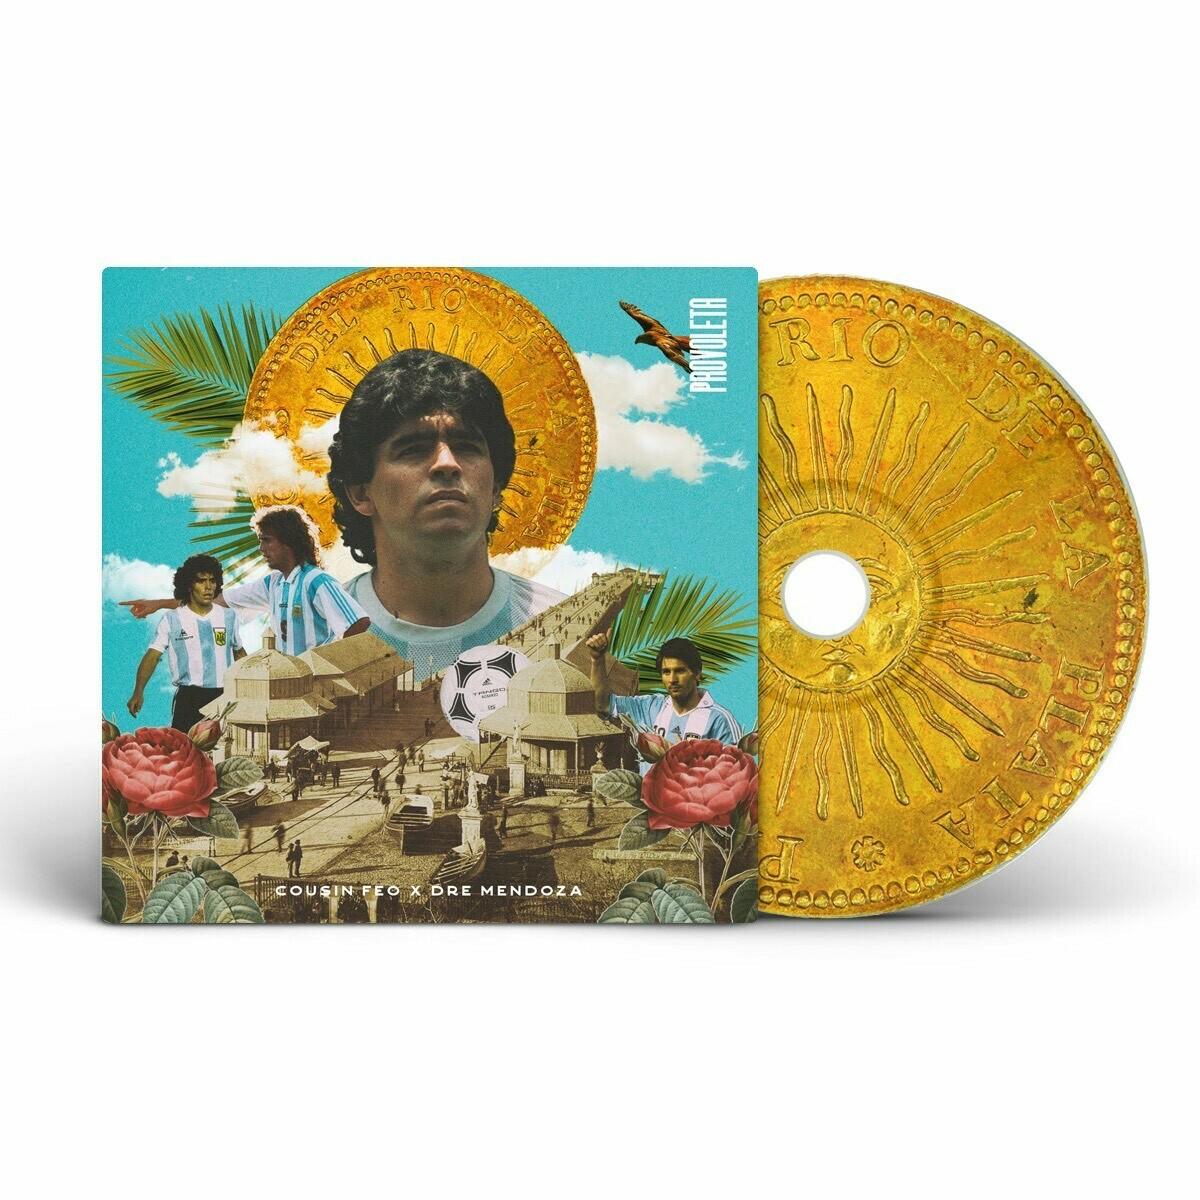 Provoleta CD